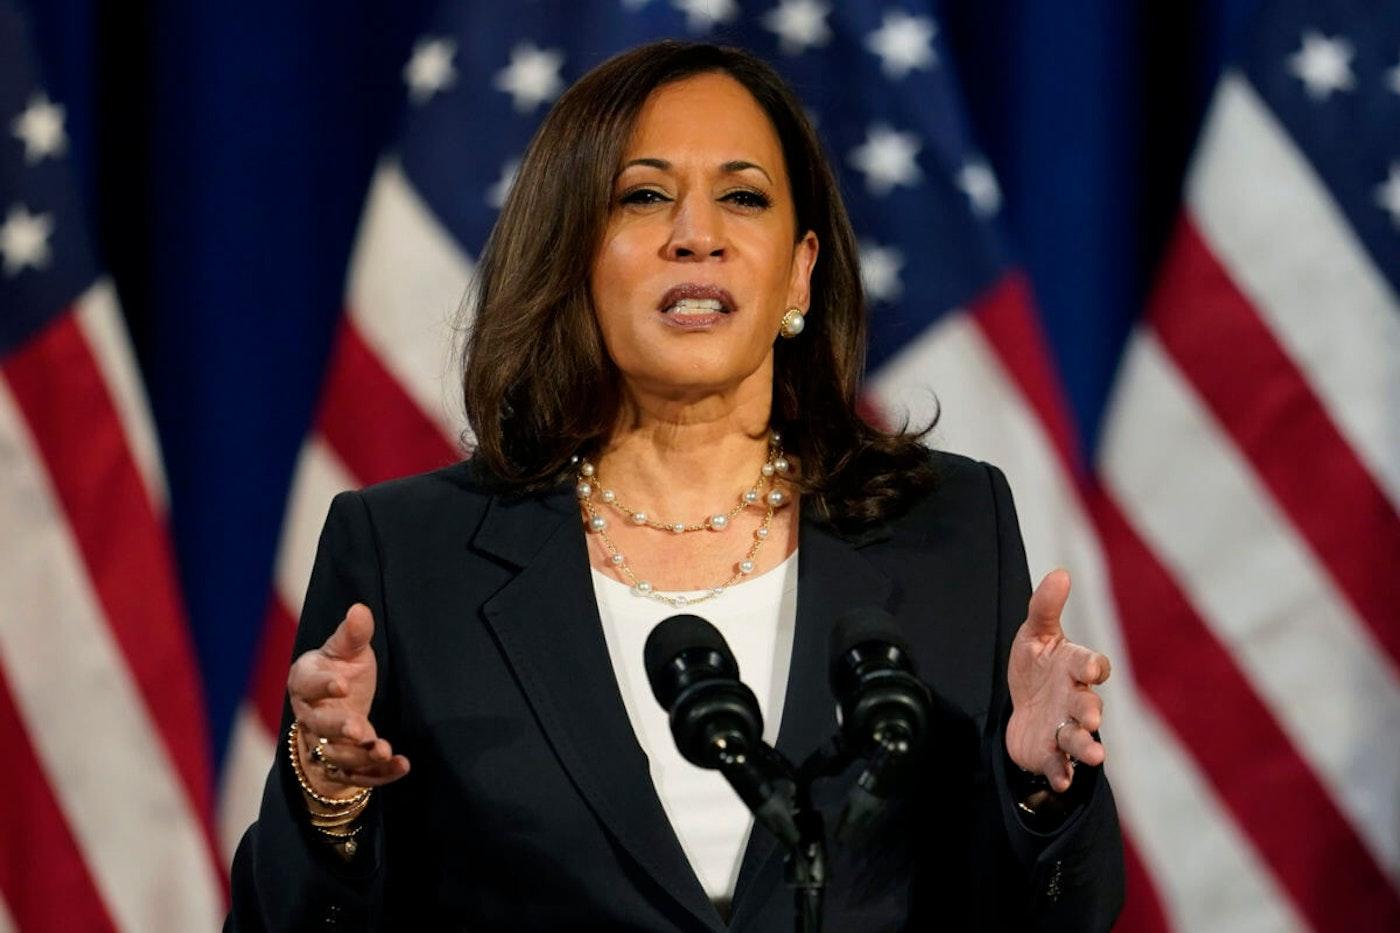 Democratic vice presidential candidate Sen. Kamala Harris, D-Calif., speaks in Washington, Thursday, Aug. 27, 2020. (AP Photo/Carolyn Kaster)